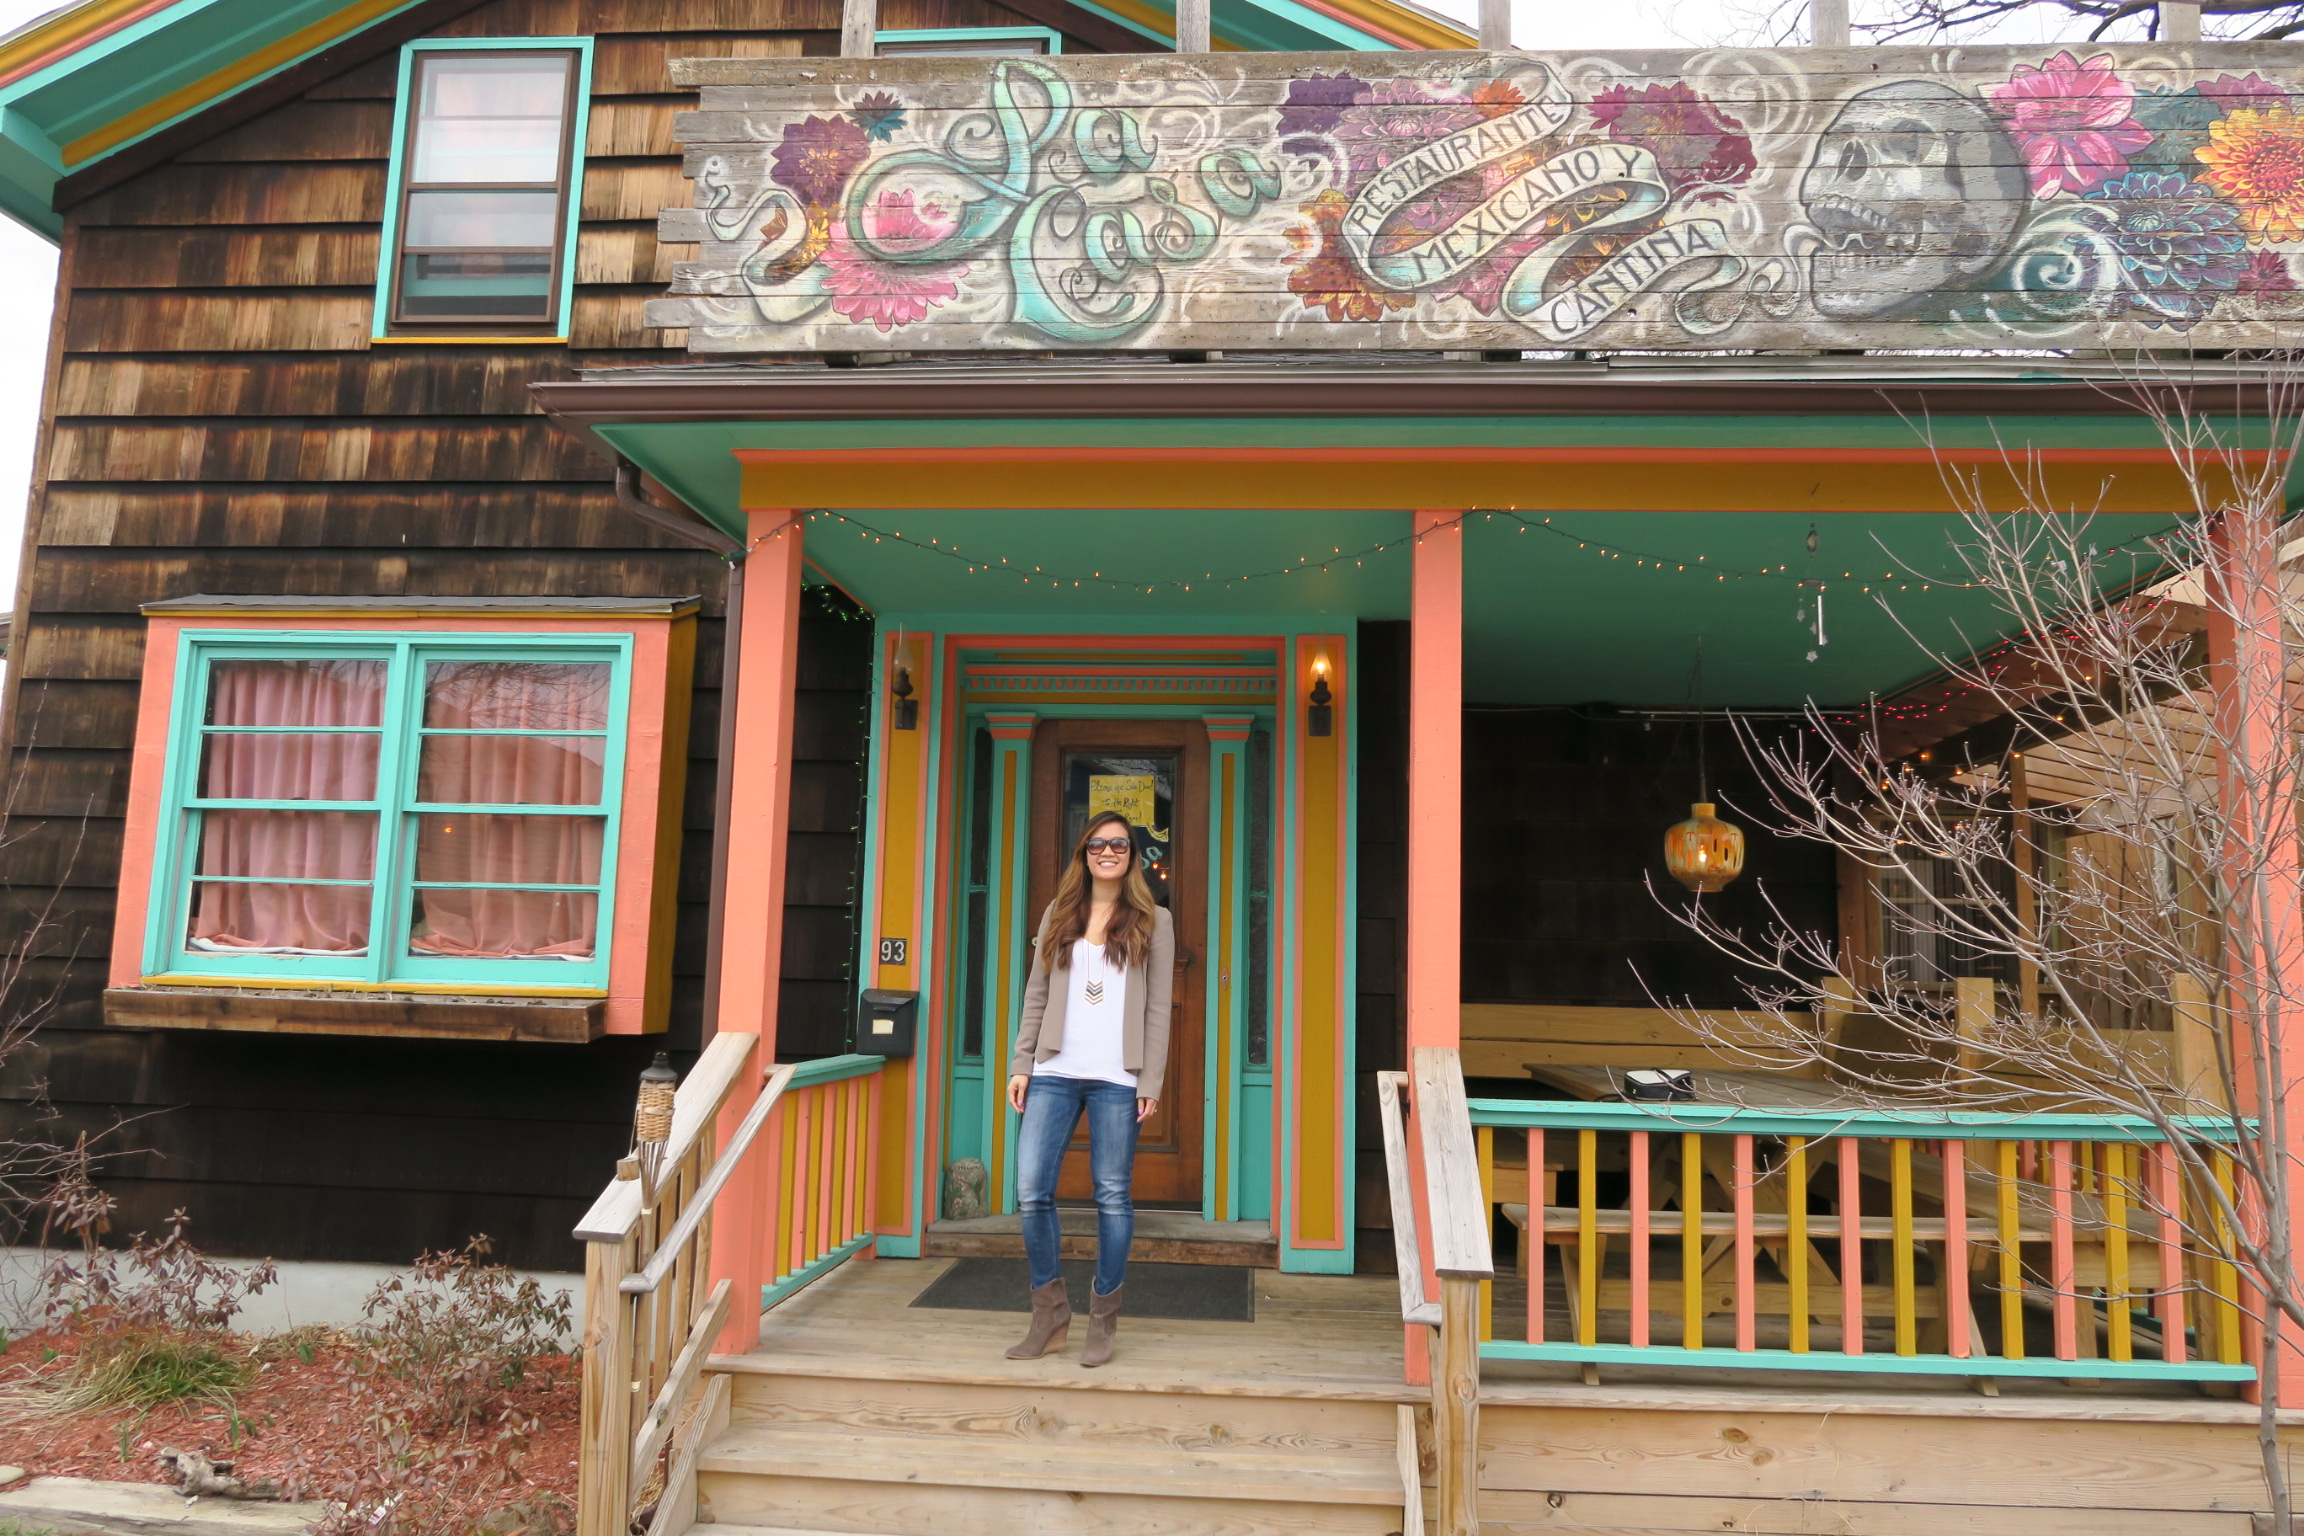 Sir Rocha Says standing in front of La Casa